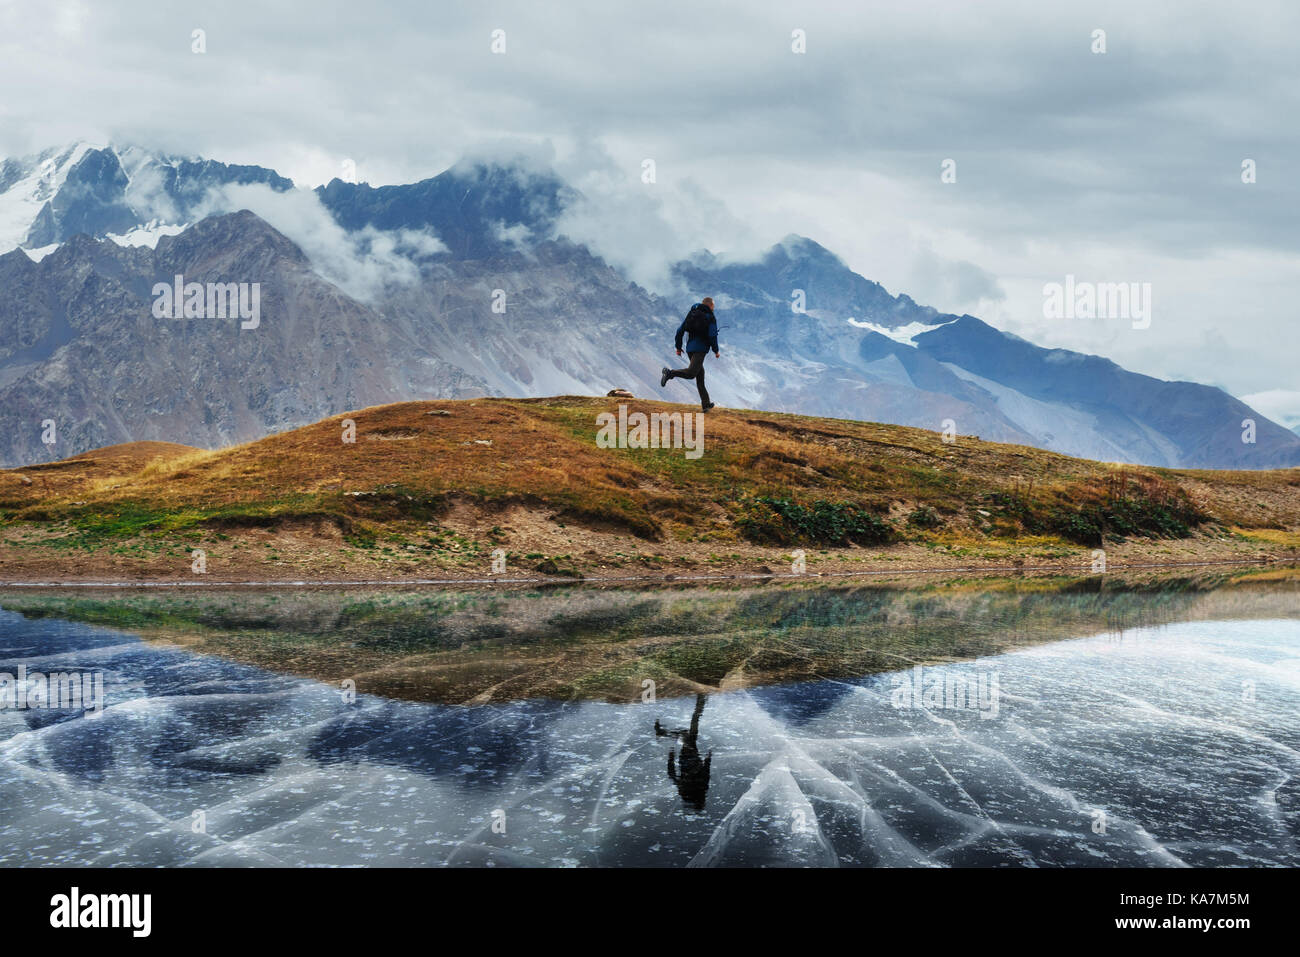 Landscape on mountain frozen lake Koruldi. Upper Svaneti, Georgia, Europe. Caucasus - Stock Image